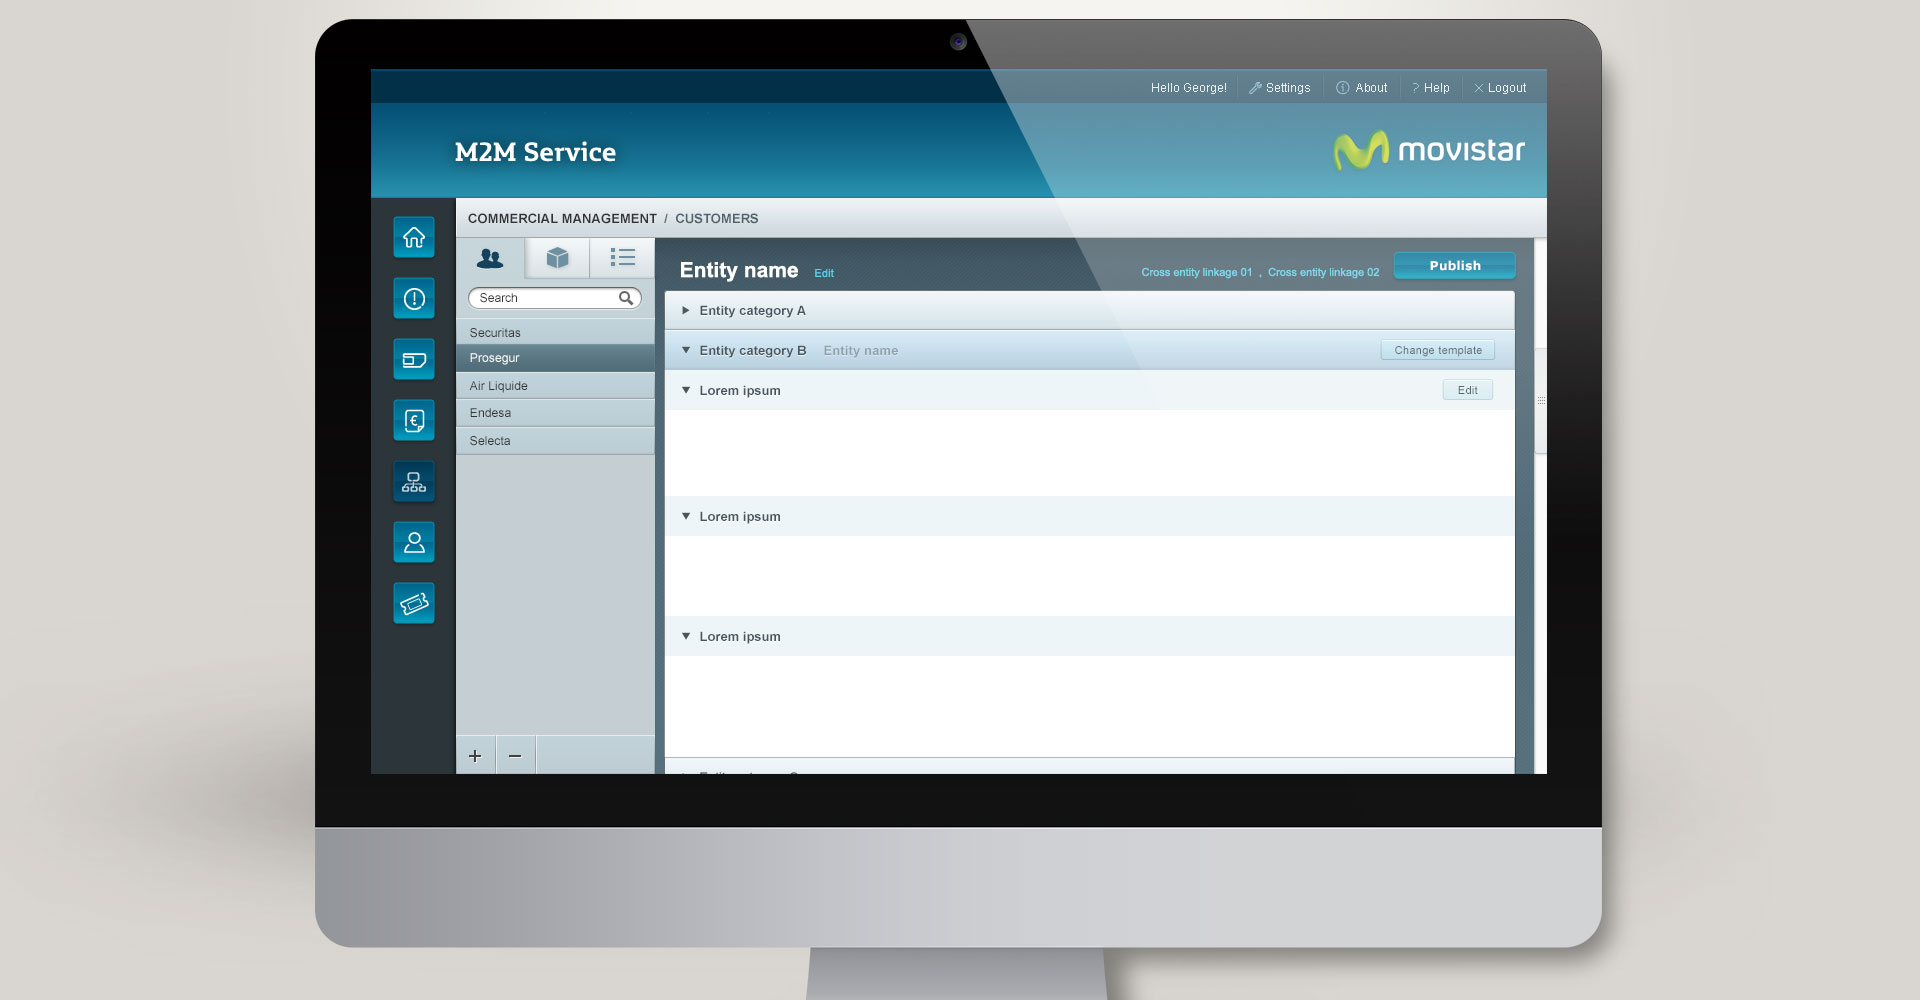 M2M Global Portal